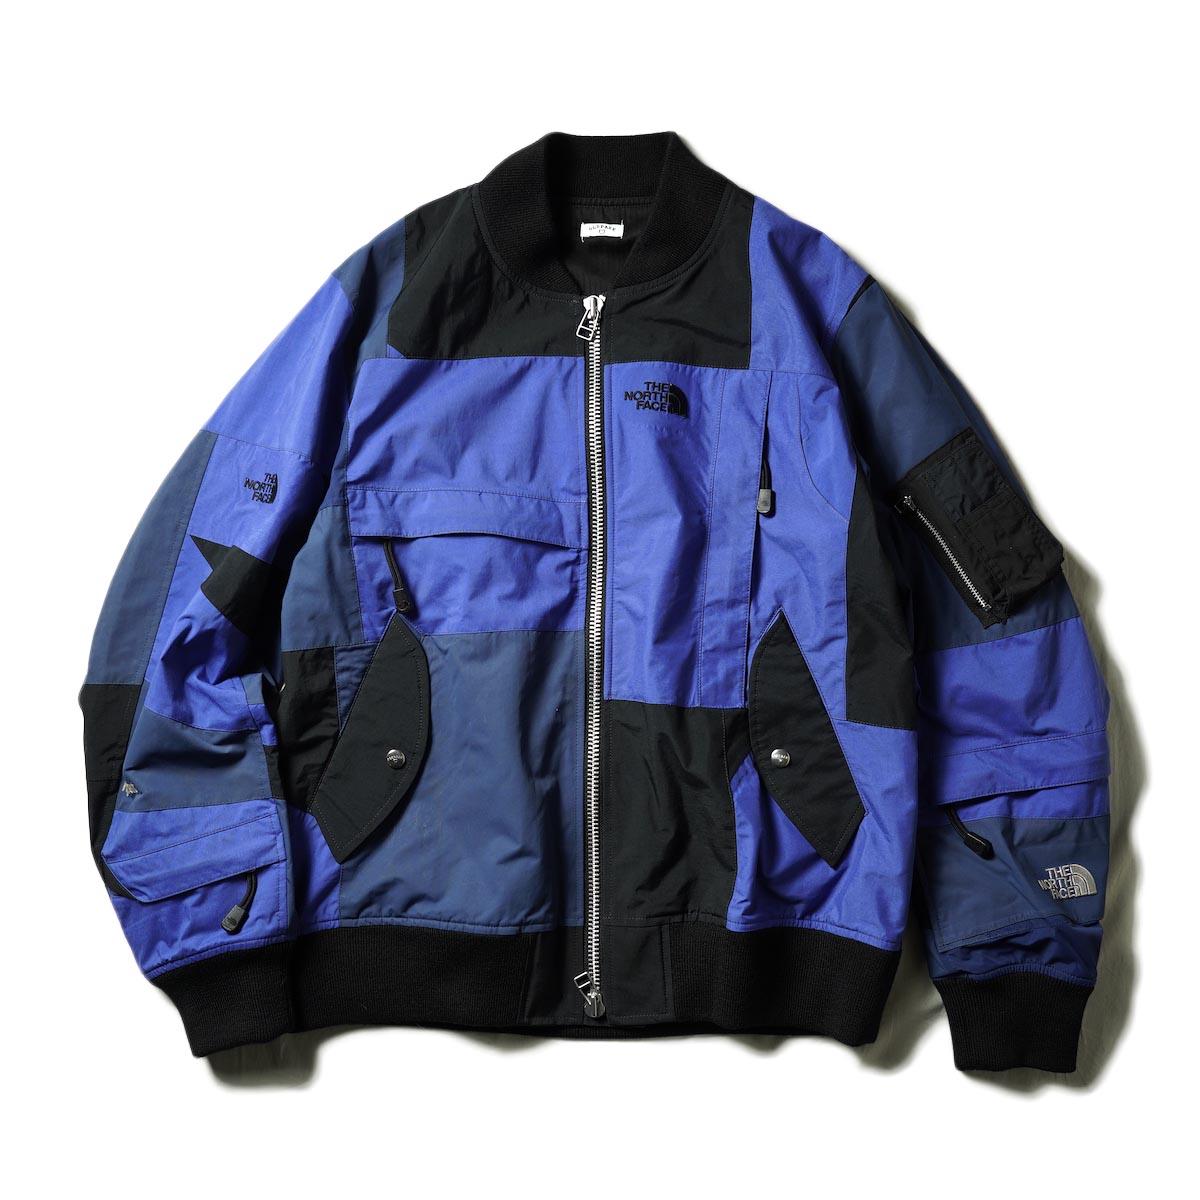 OLD PARK / Flight Jacket Outdoor (XLsize)